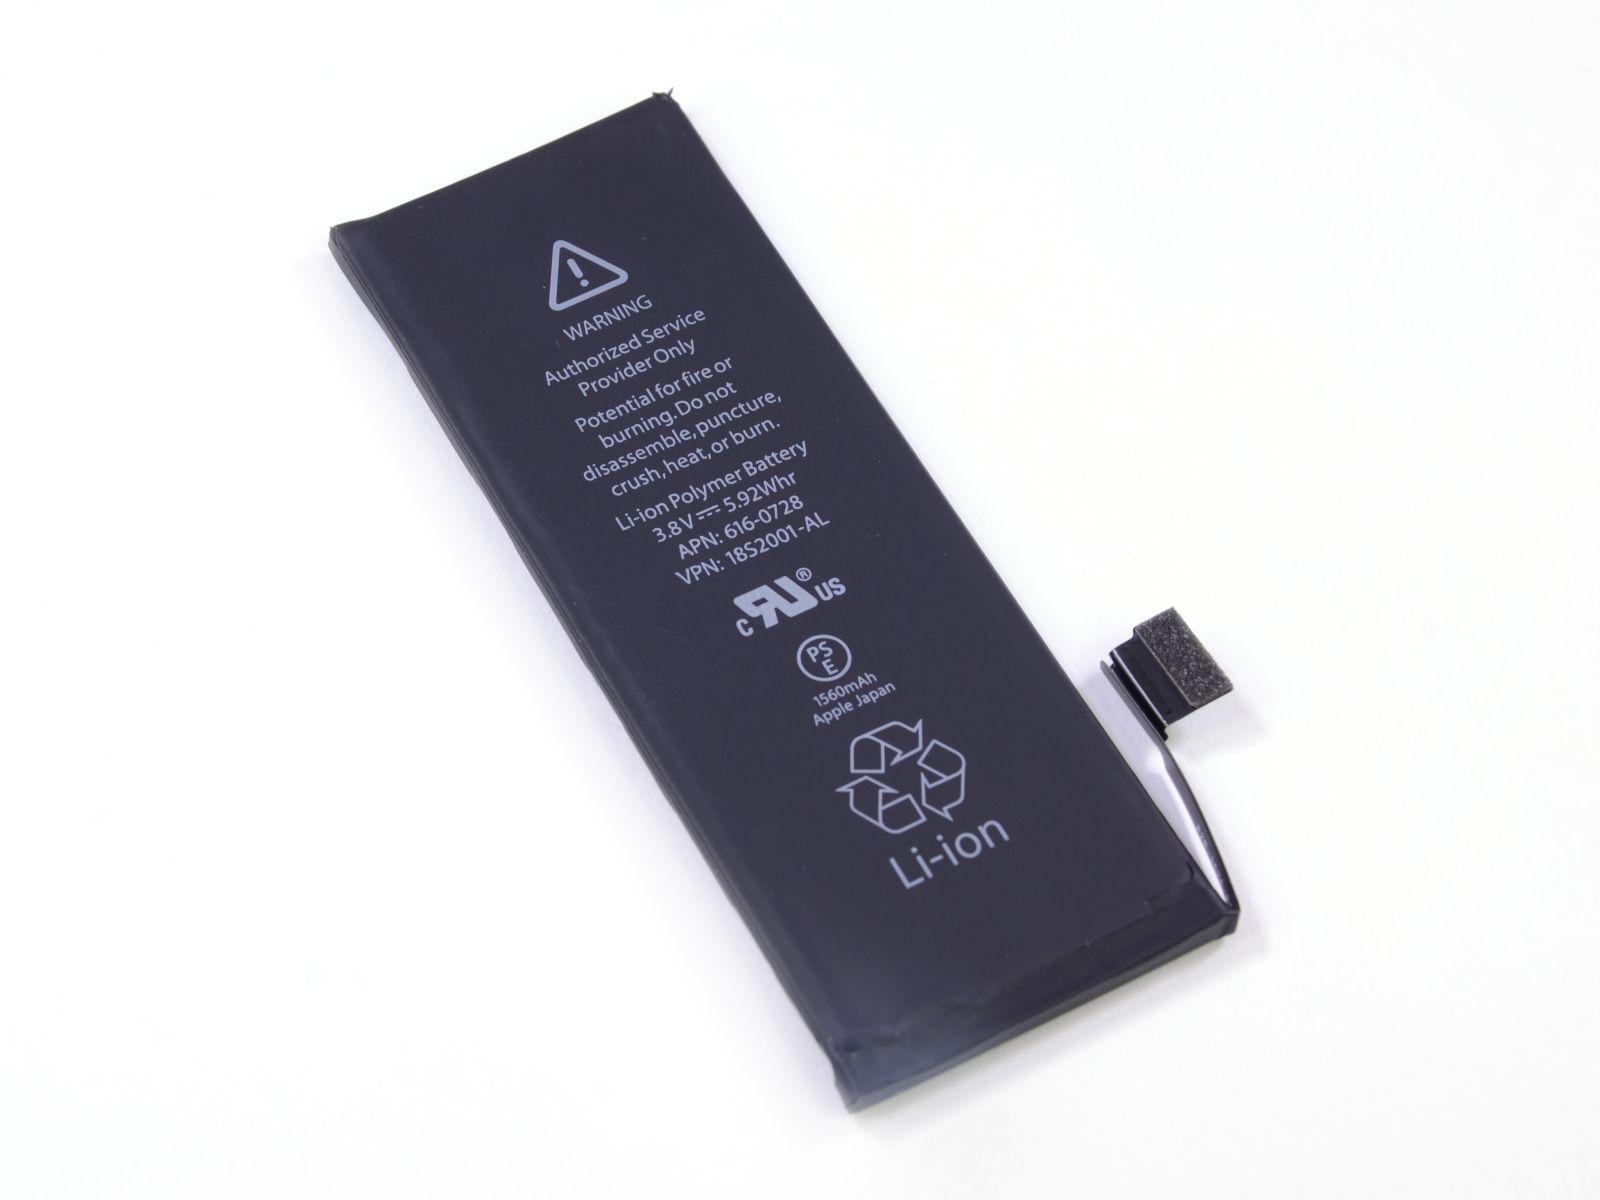 kak-razobrat-iphone-5s-18